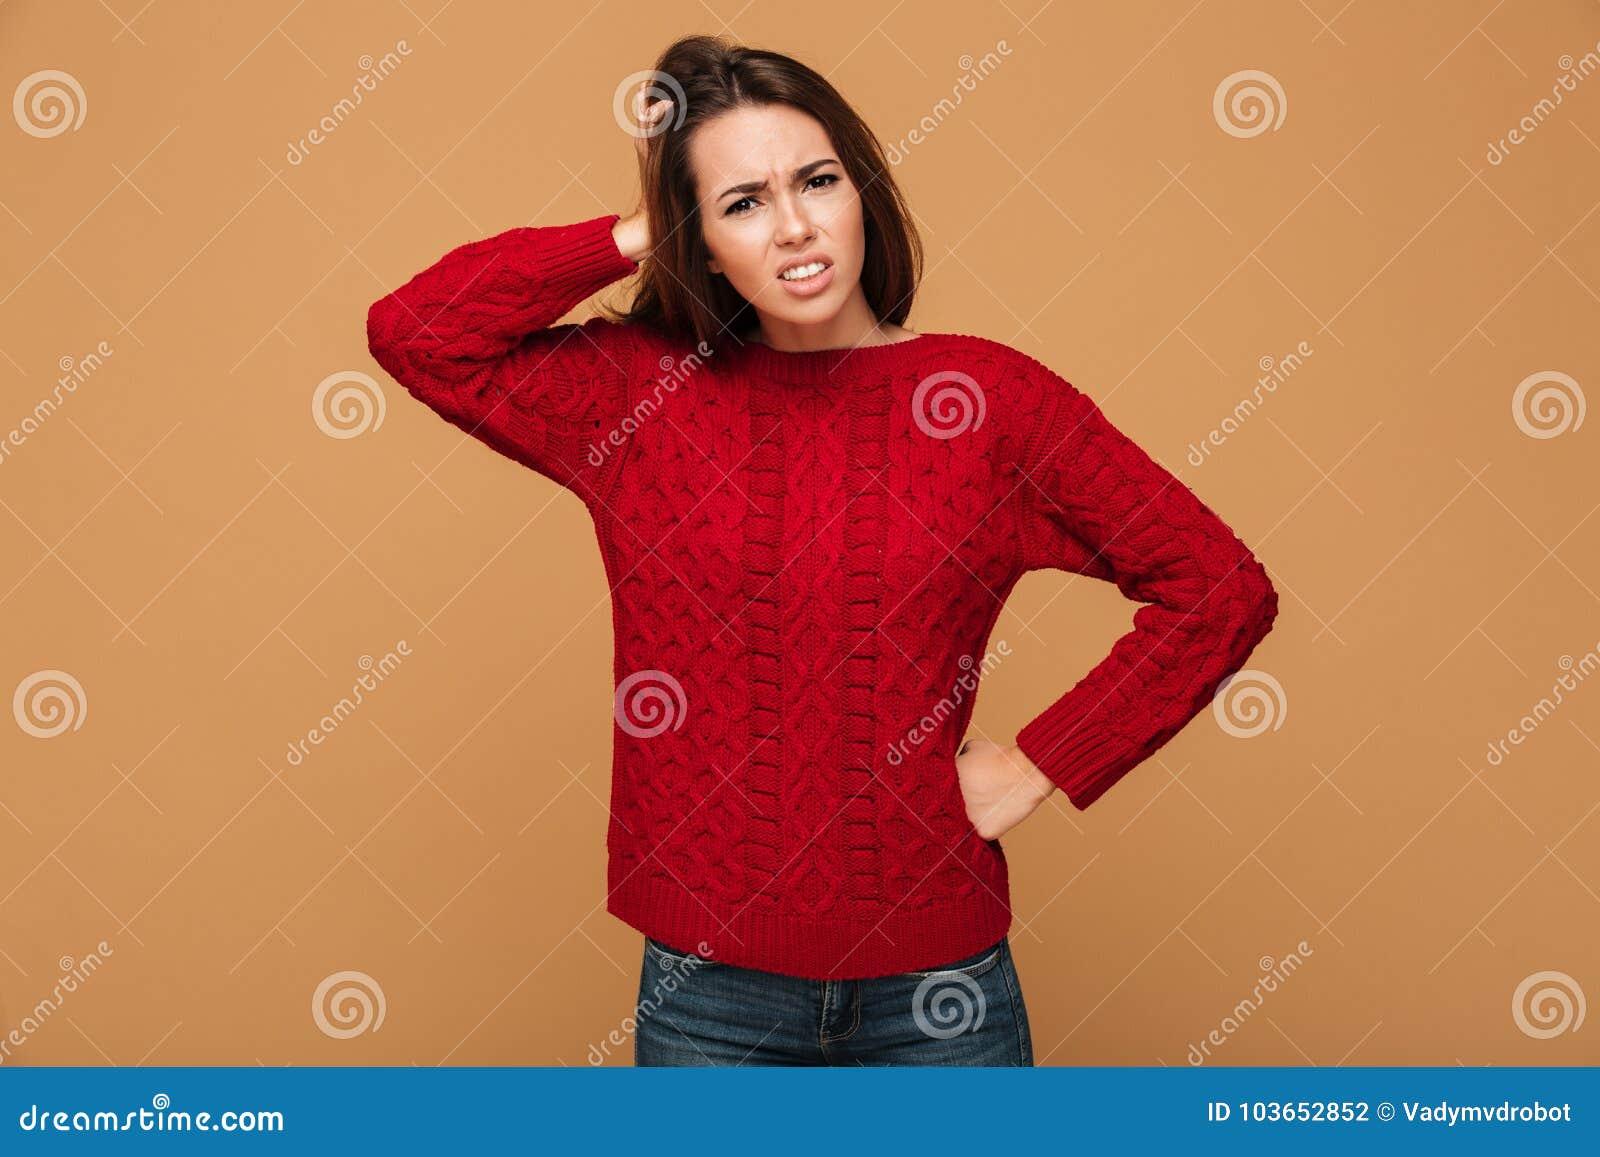 c9060b96ebe0 Ματαιωμένη νέα γυναίκα brunette στο κόκκινο πλεκτό πουλόβερ με το χέρι